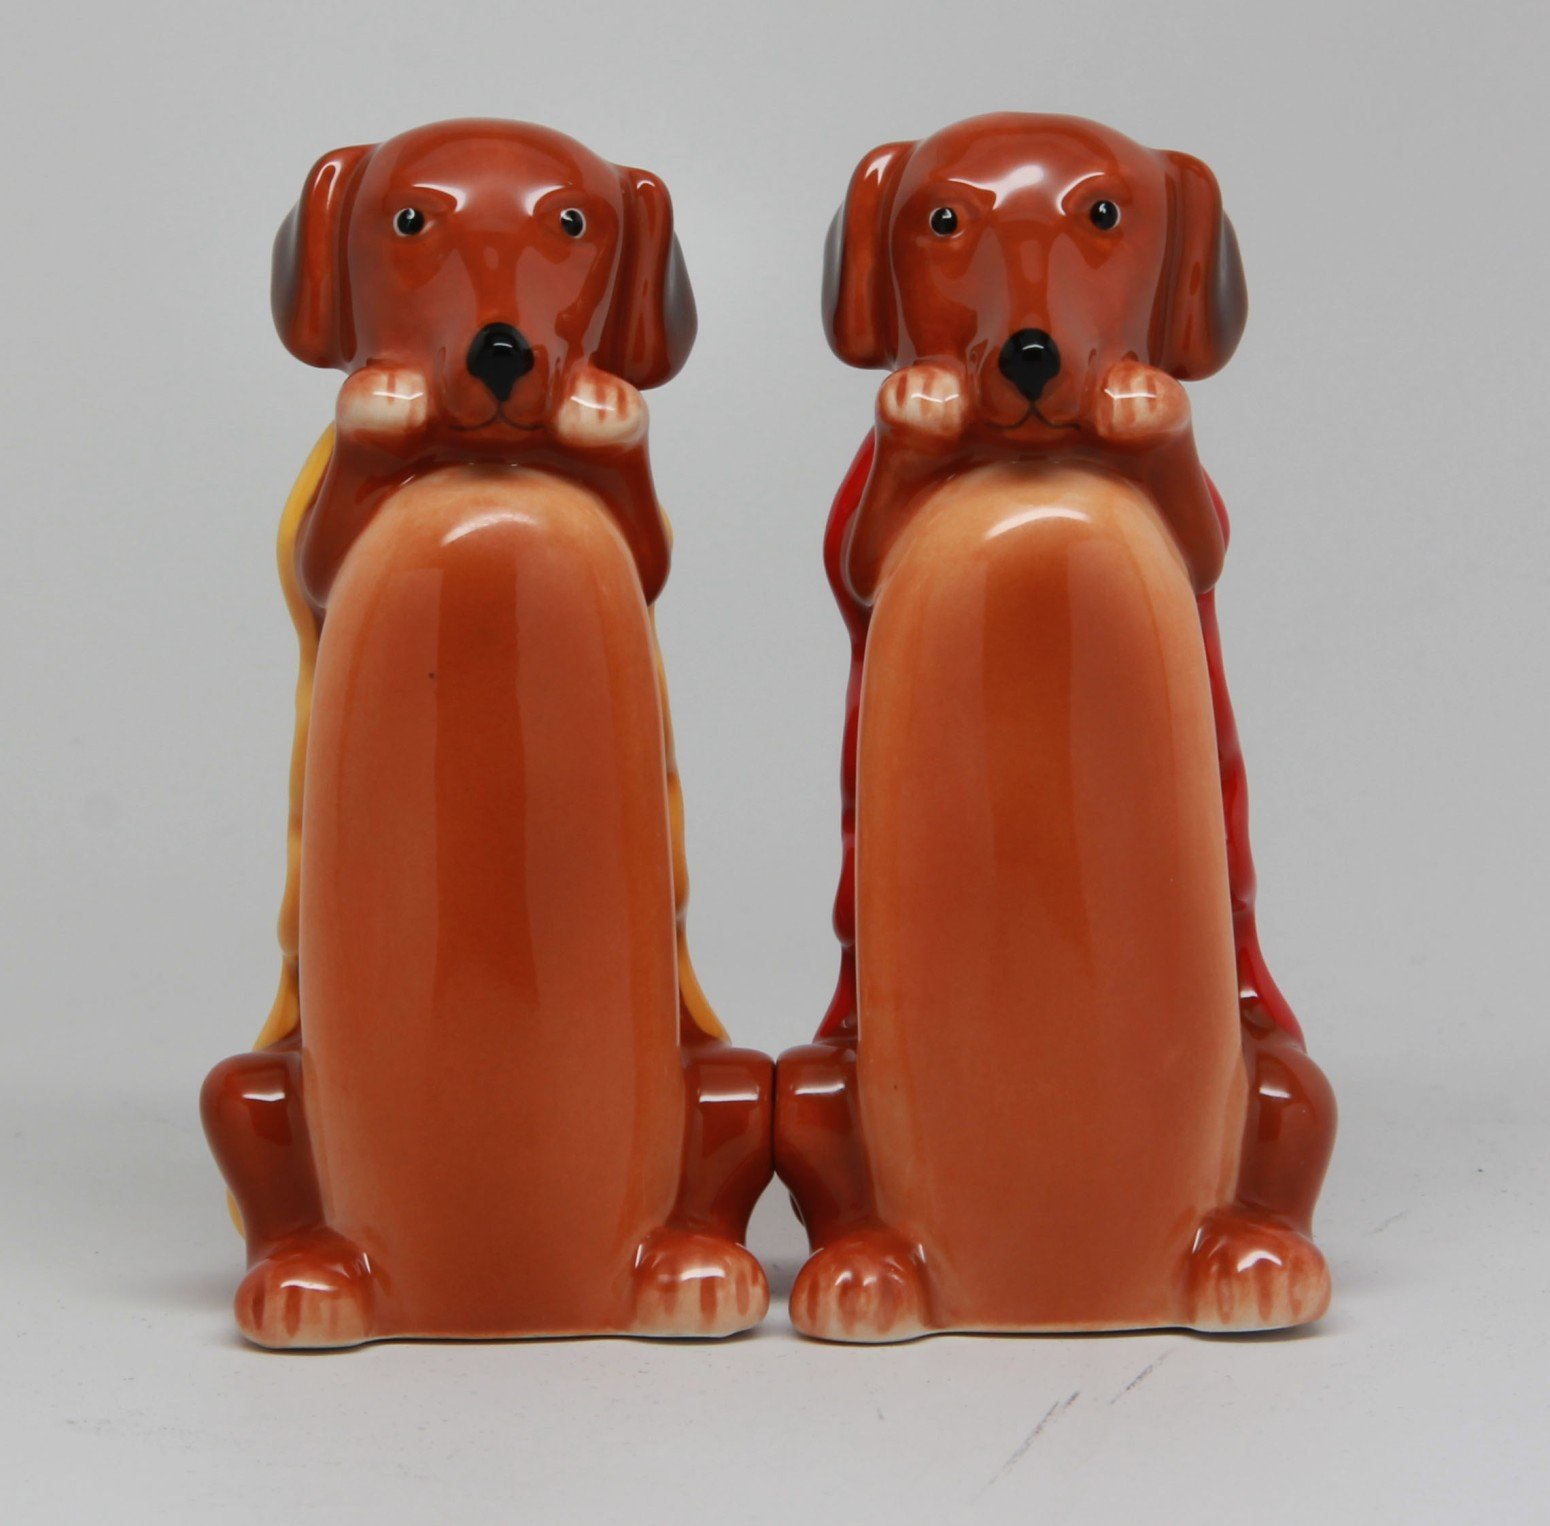 Weiner InchHot Inch Dog in Bun 3 Inch Ceramic Magnetic Salt and Pepper Shaker Set Fun Novelty Gift